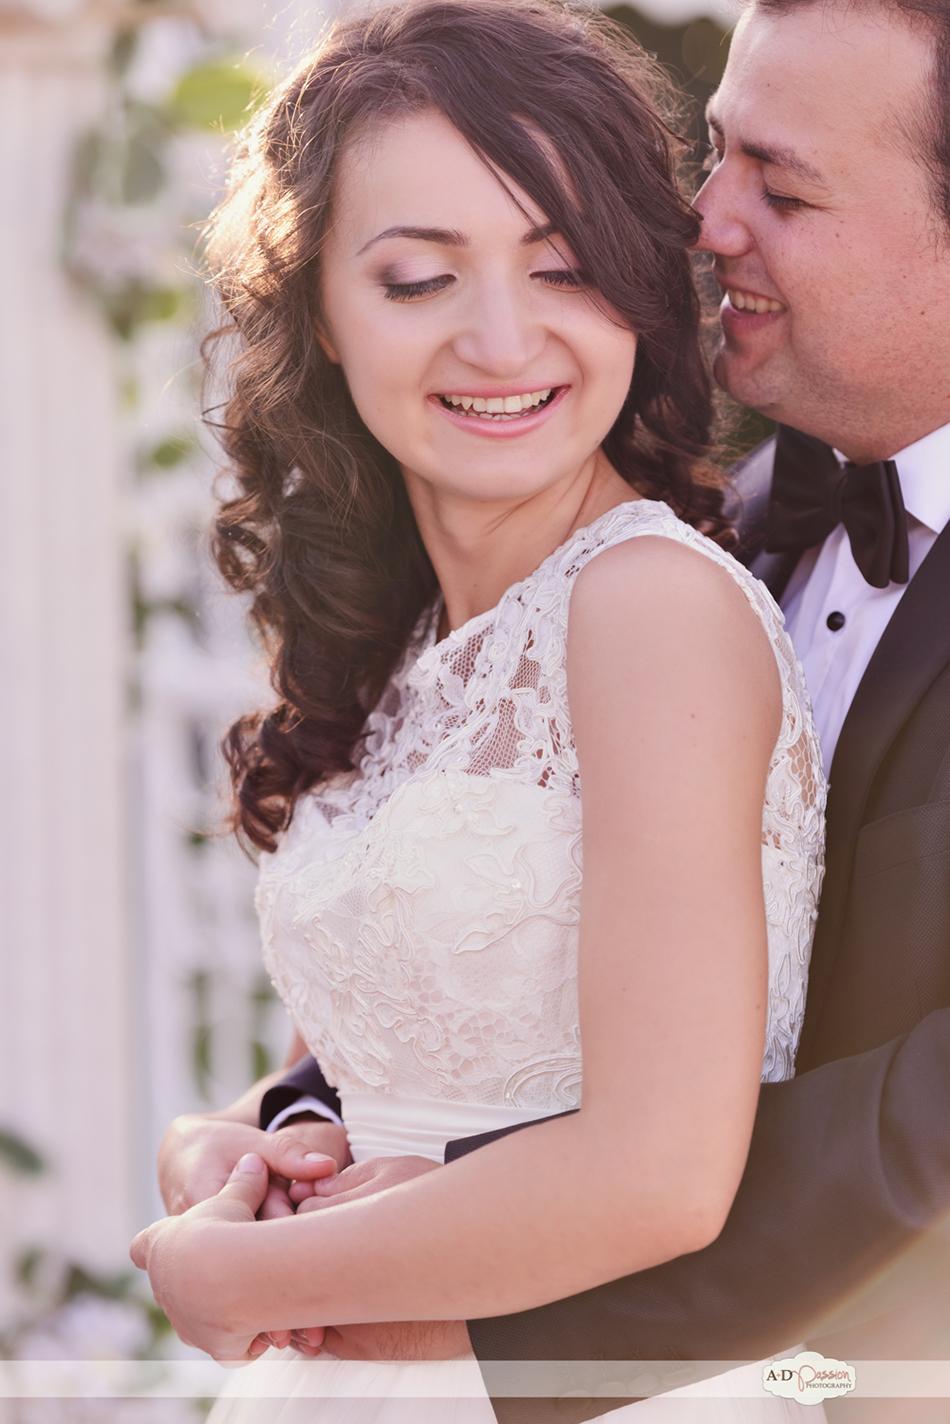 AD Passion Photography | nunta-andreea-si-ovi_nunta-vintage-timisoara-fotograf-de-nunta-profesionist_063 | Adelin, Dida, fotograf profesionist, fotograf de nunta, fotografie de nunta, fotograf Timisoara, fotograf Craiova, fotograf Bucuresti, fotograf Arad, nunta Timisoara, nunta Arad, nunta Bucuresti, nunta Craiova